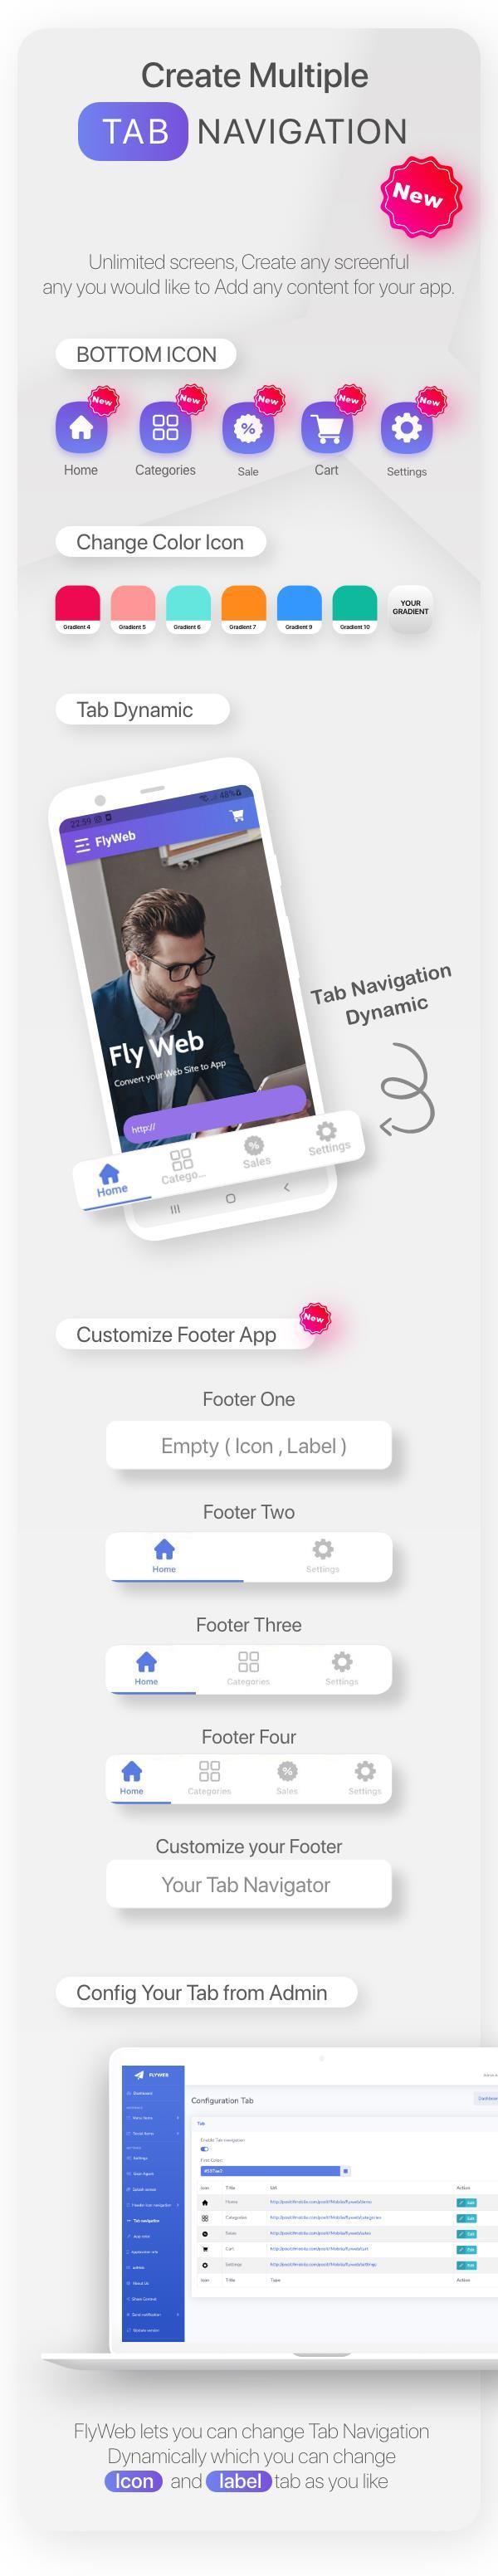 FlyWeb for Web to App Convertor Flutter + Admin Panel - 12